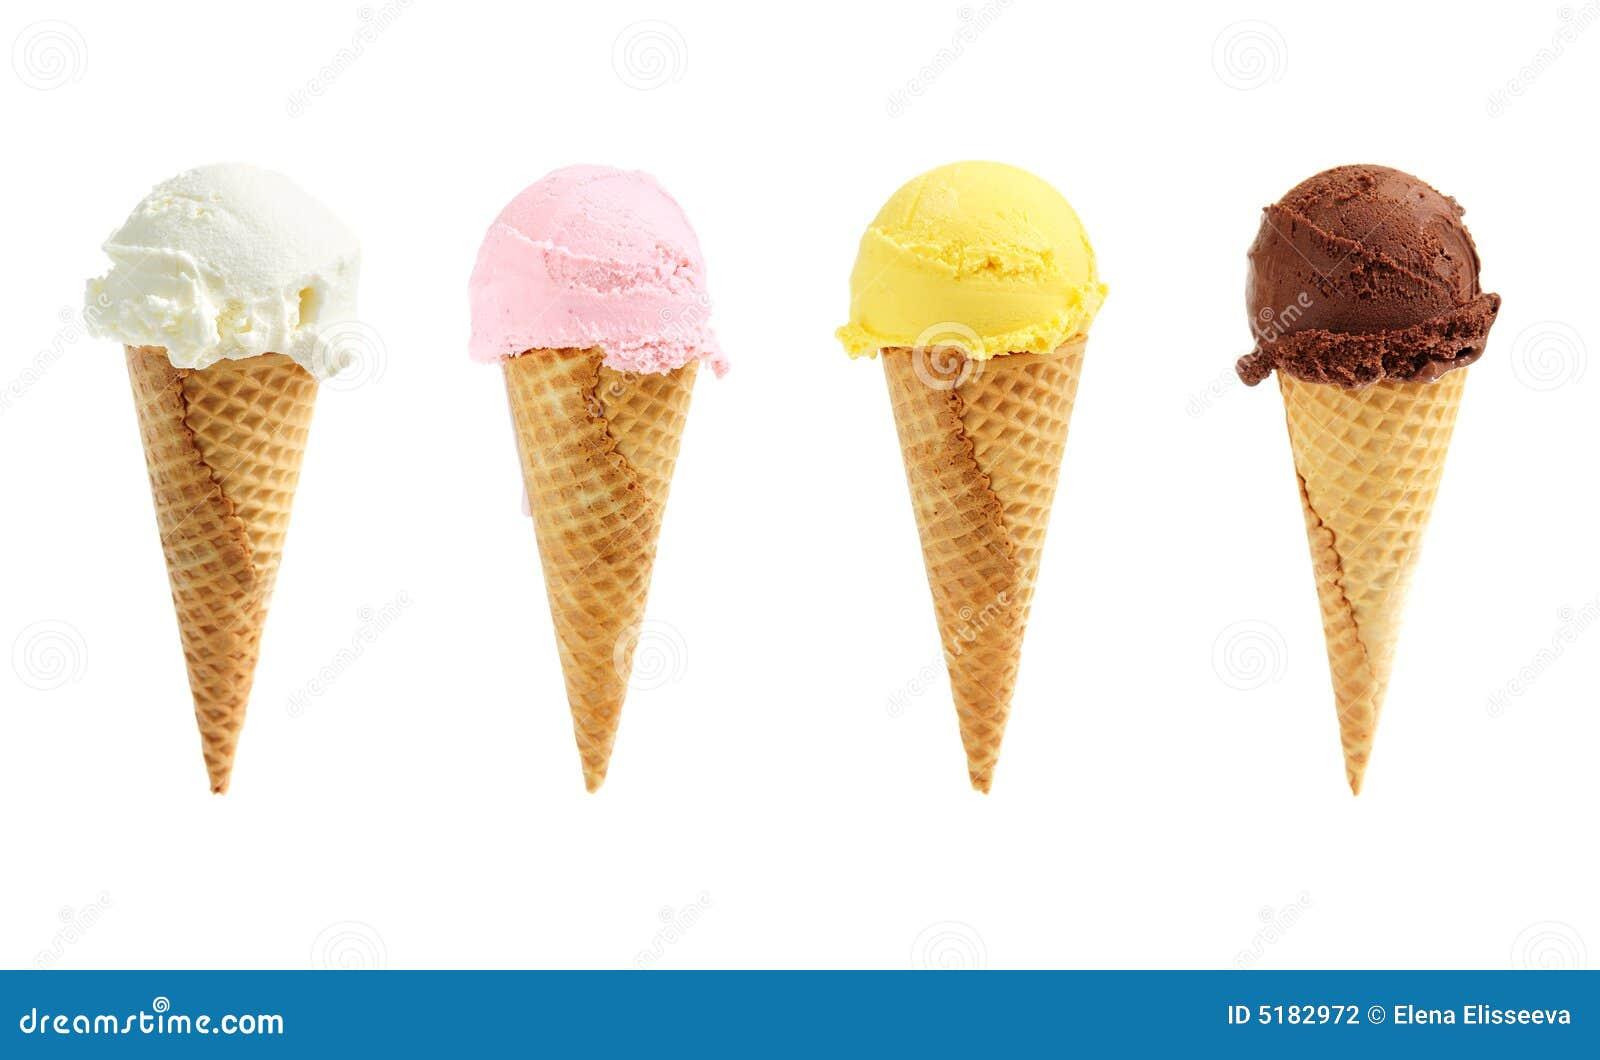 Sugar Free Ice Cream Natural